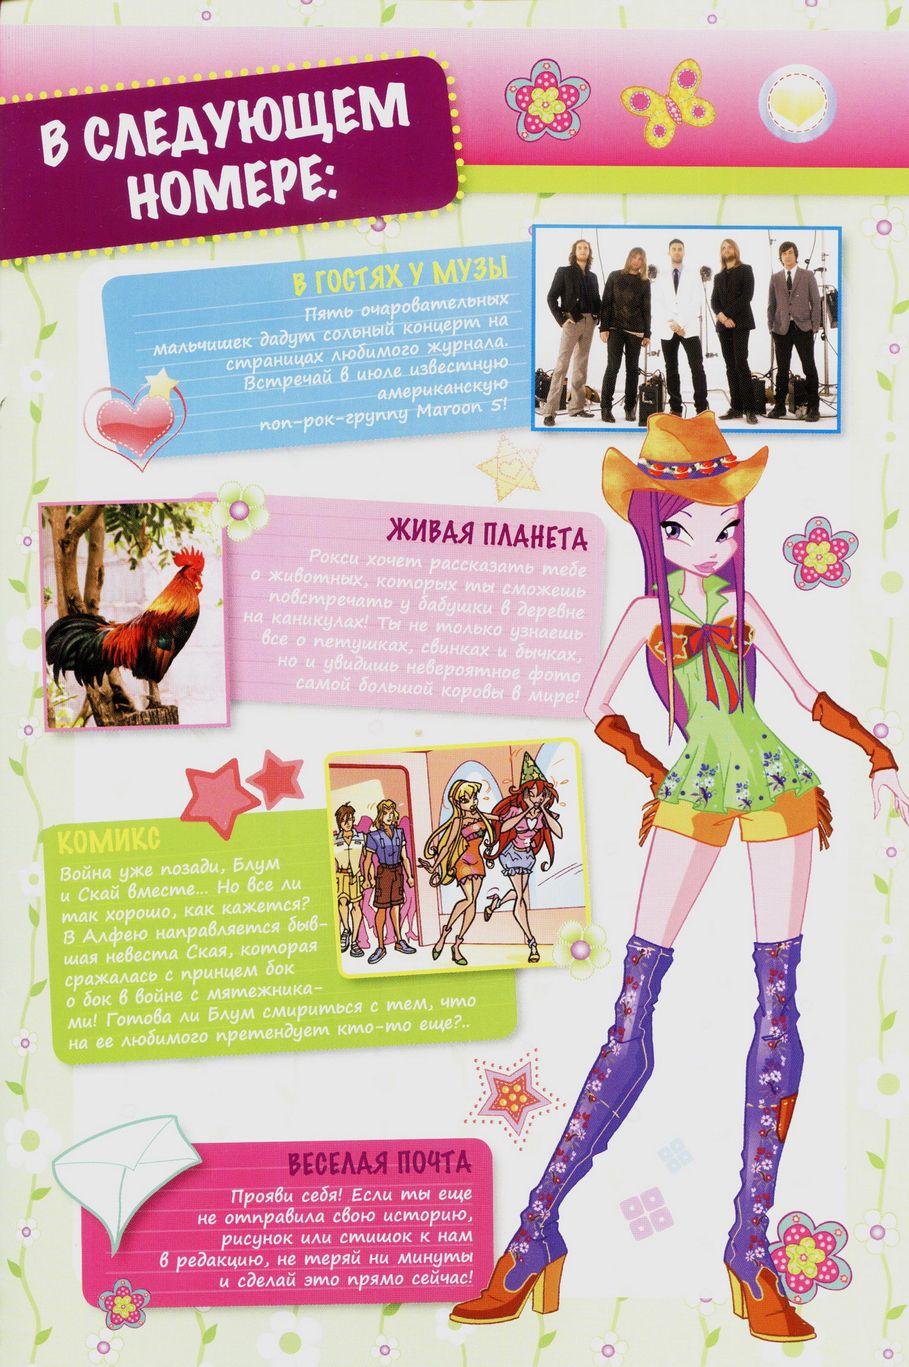 Комикс Винкс Winx - Волшебник Камуд (Журнал Винкс №6 2011) - стр. 67